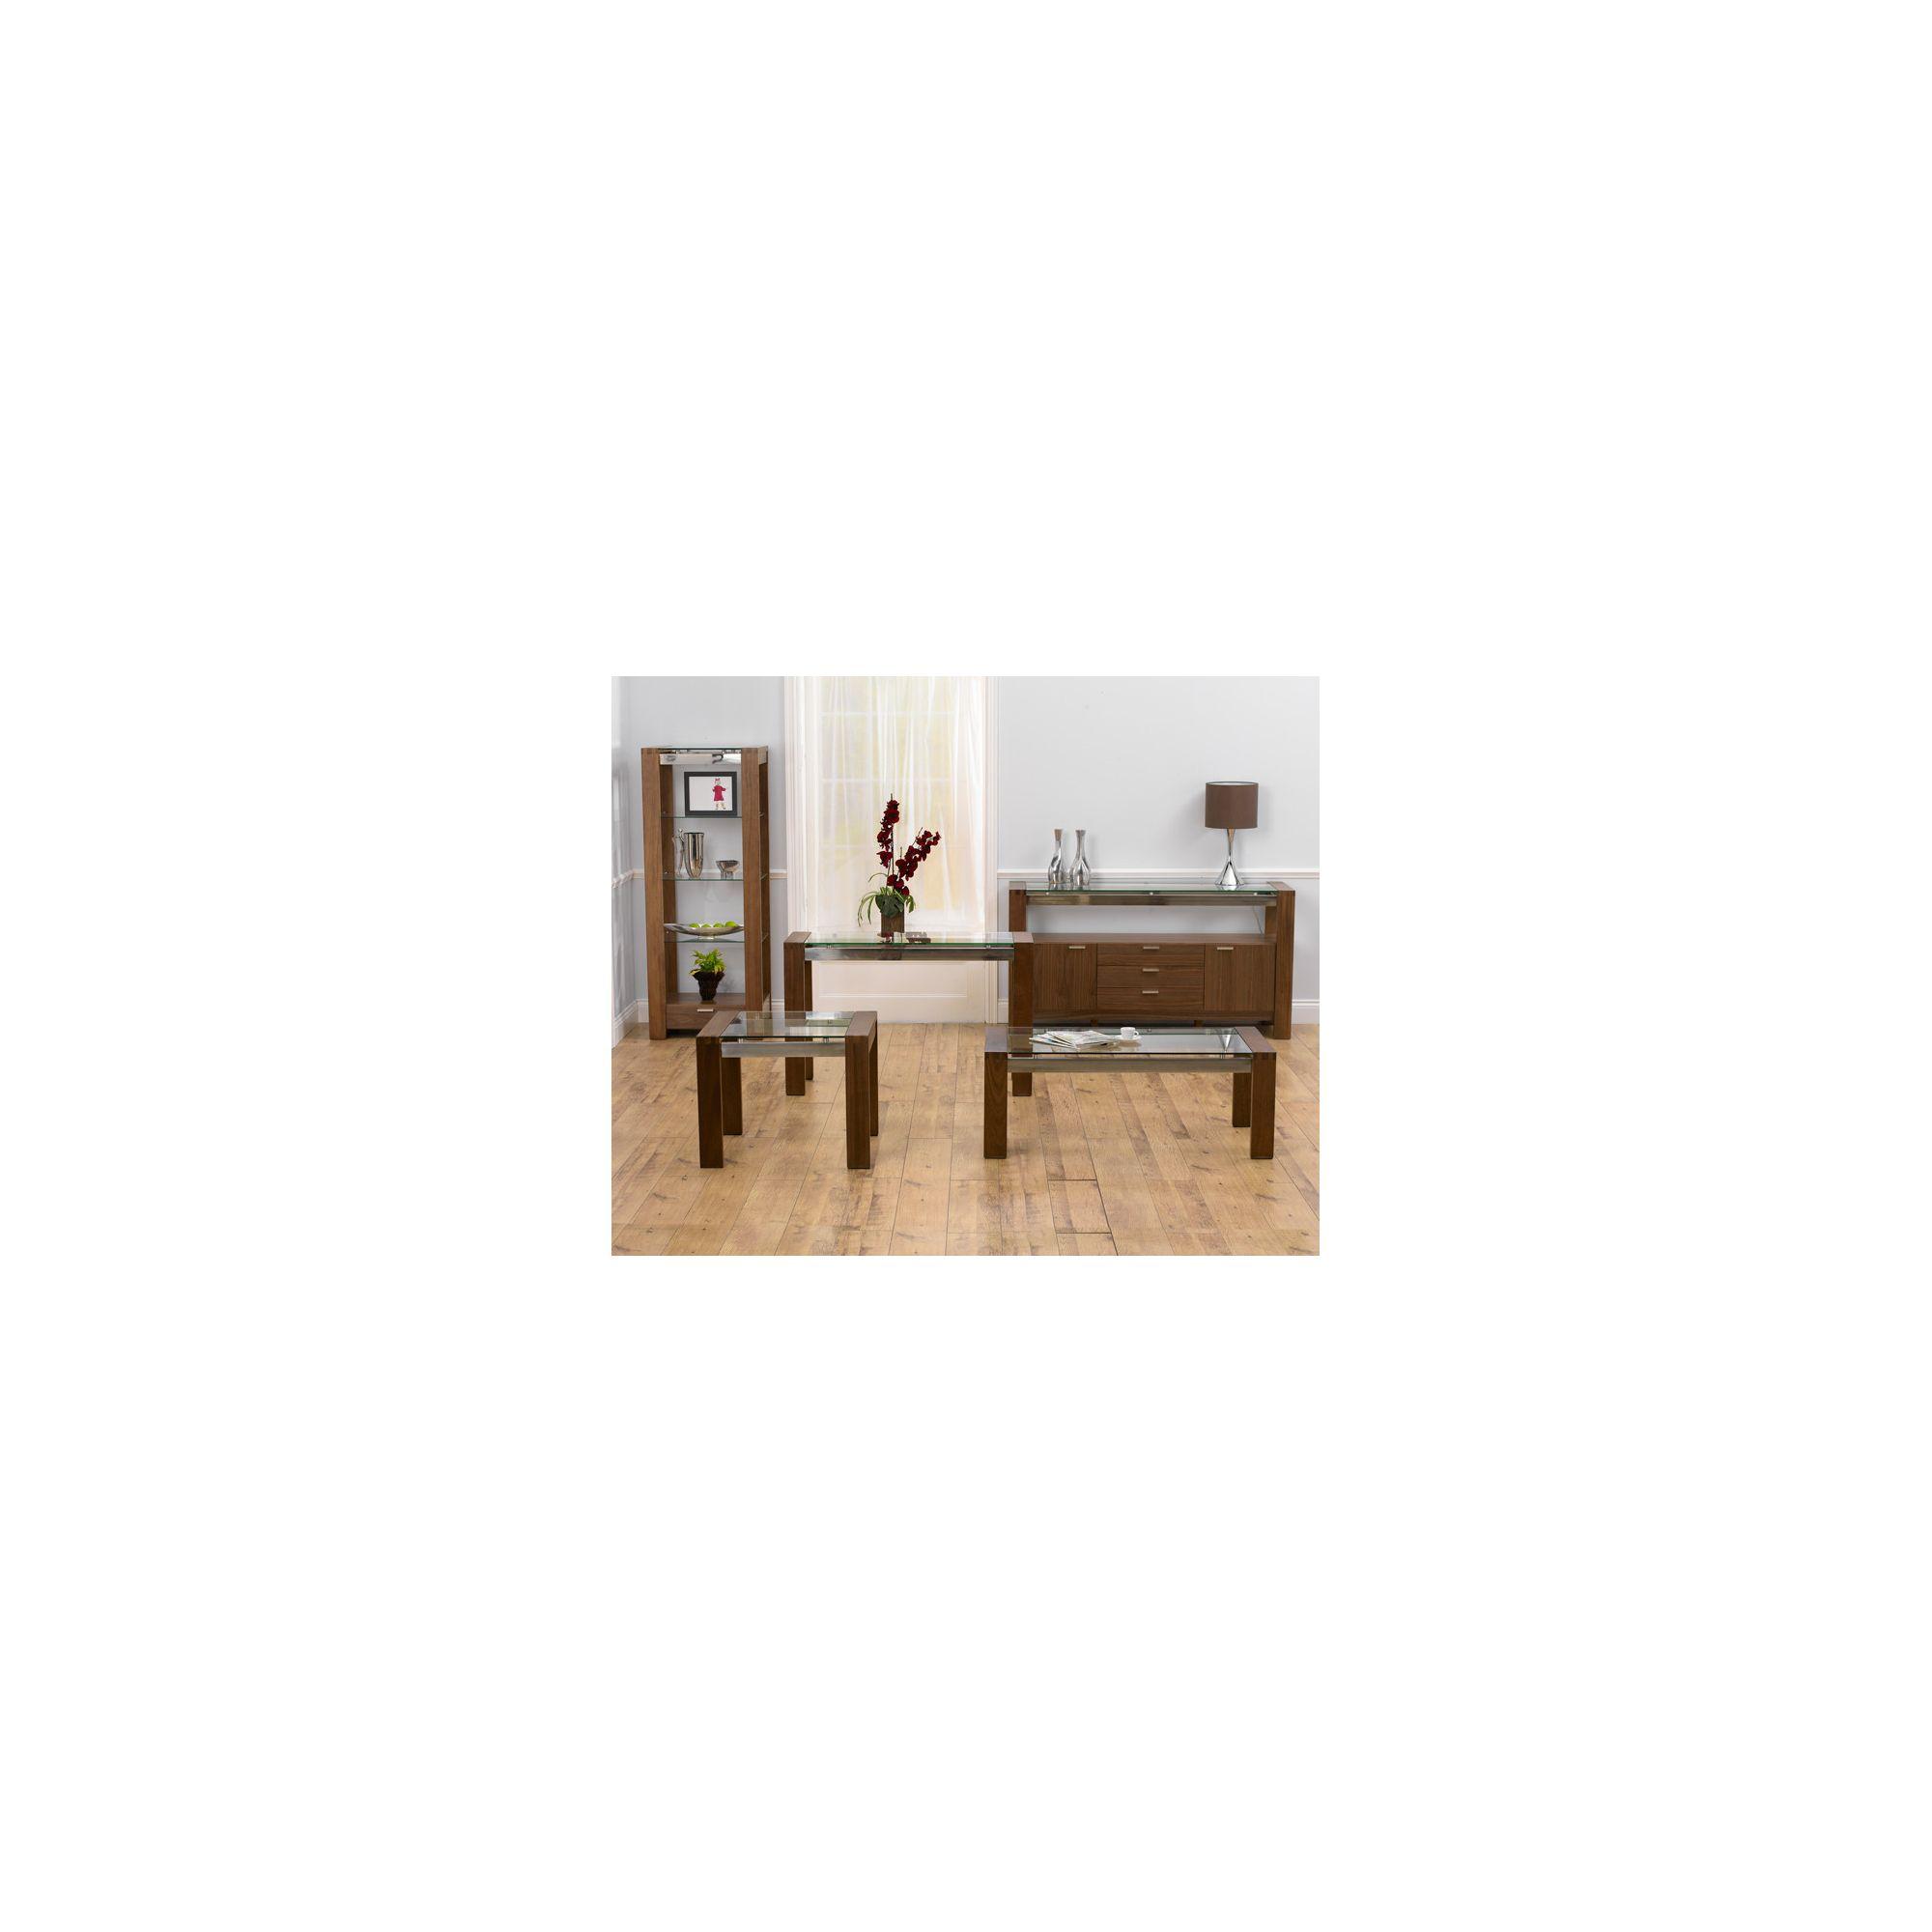 Mark Harris Furniture Roma Sideboard - Walnut at Tesco Direct